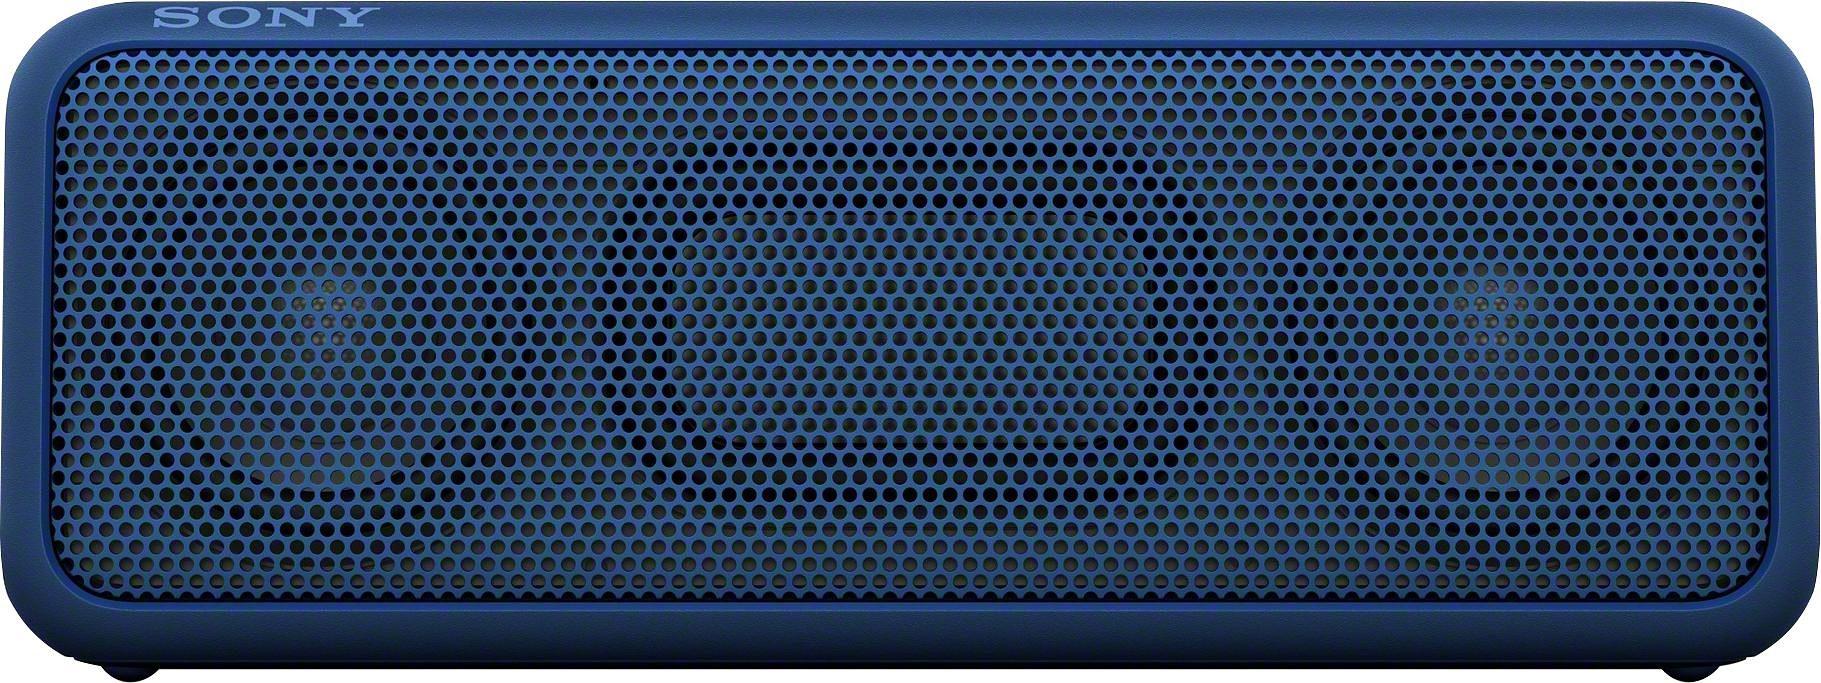 Sony SRS-XB3 tragbarer kabelloser wasserfester Lautsprecher, Bluetooth,NFC, USB mit Freisprechfunktion